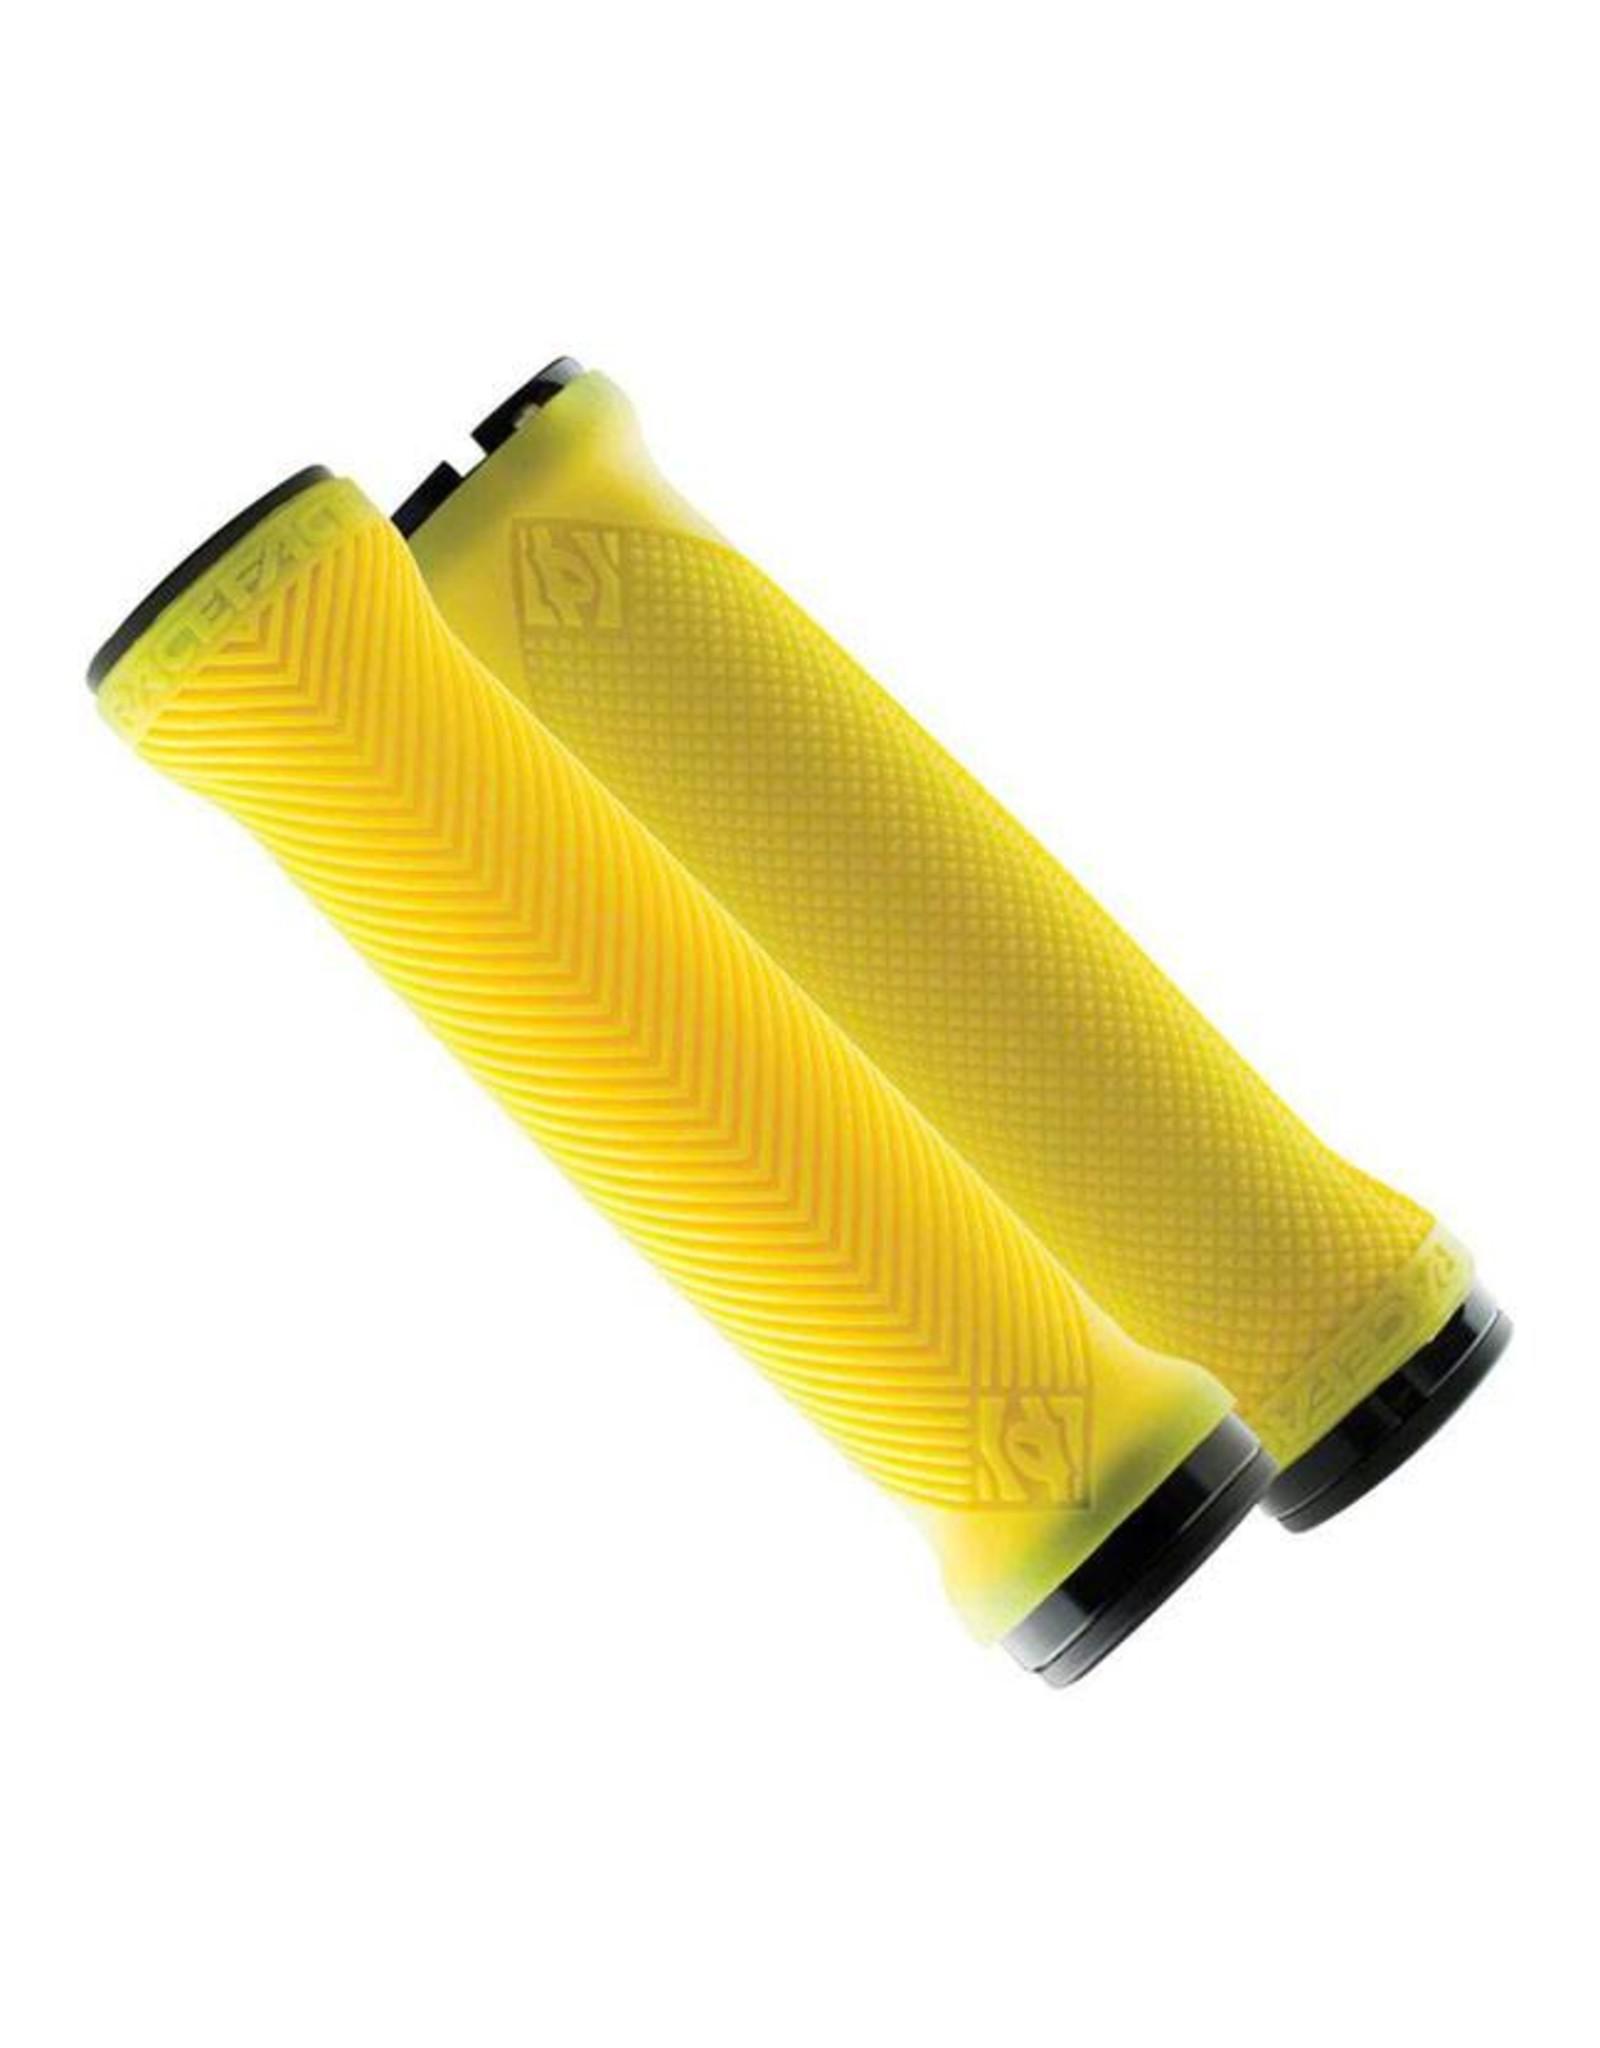 RaceFace RaceFace Lovehandle Grip: Neon Yellow